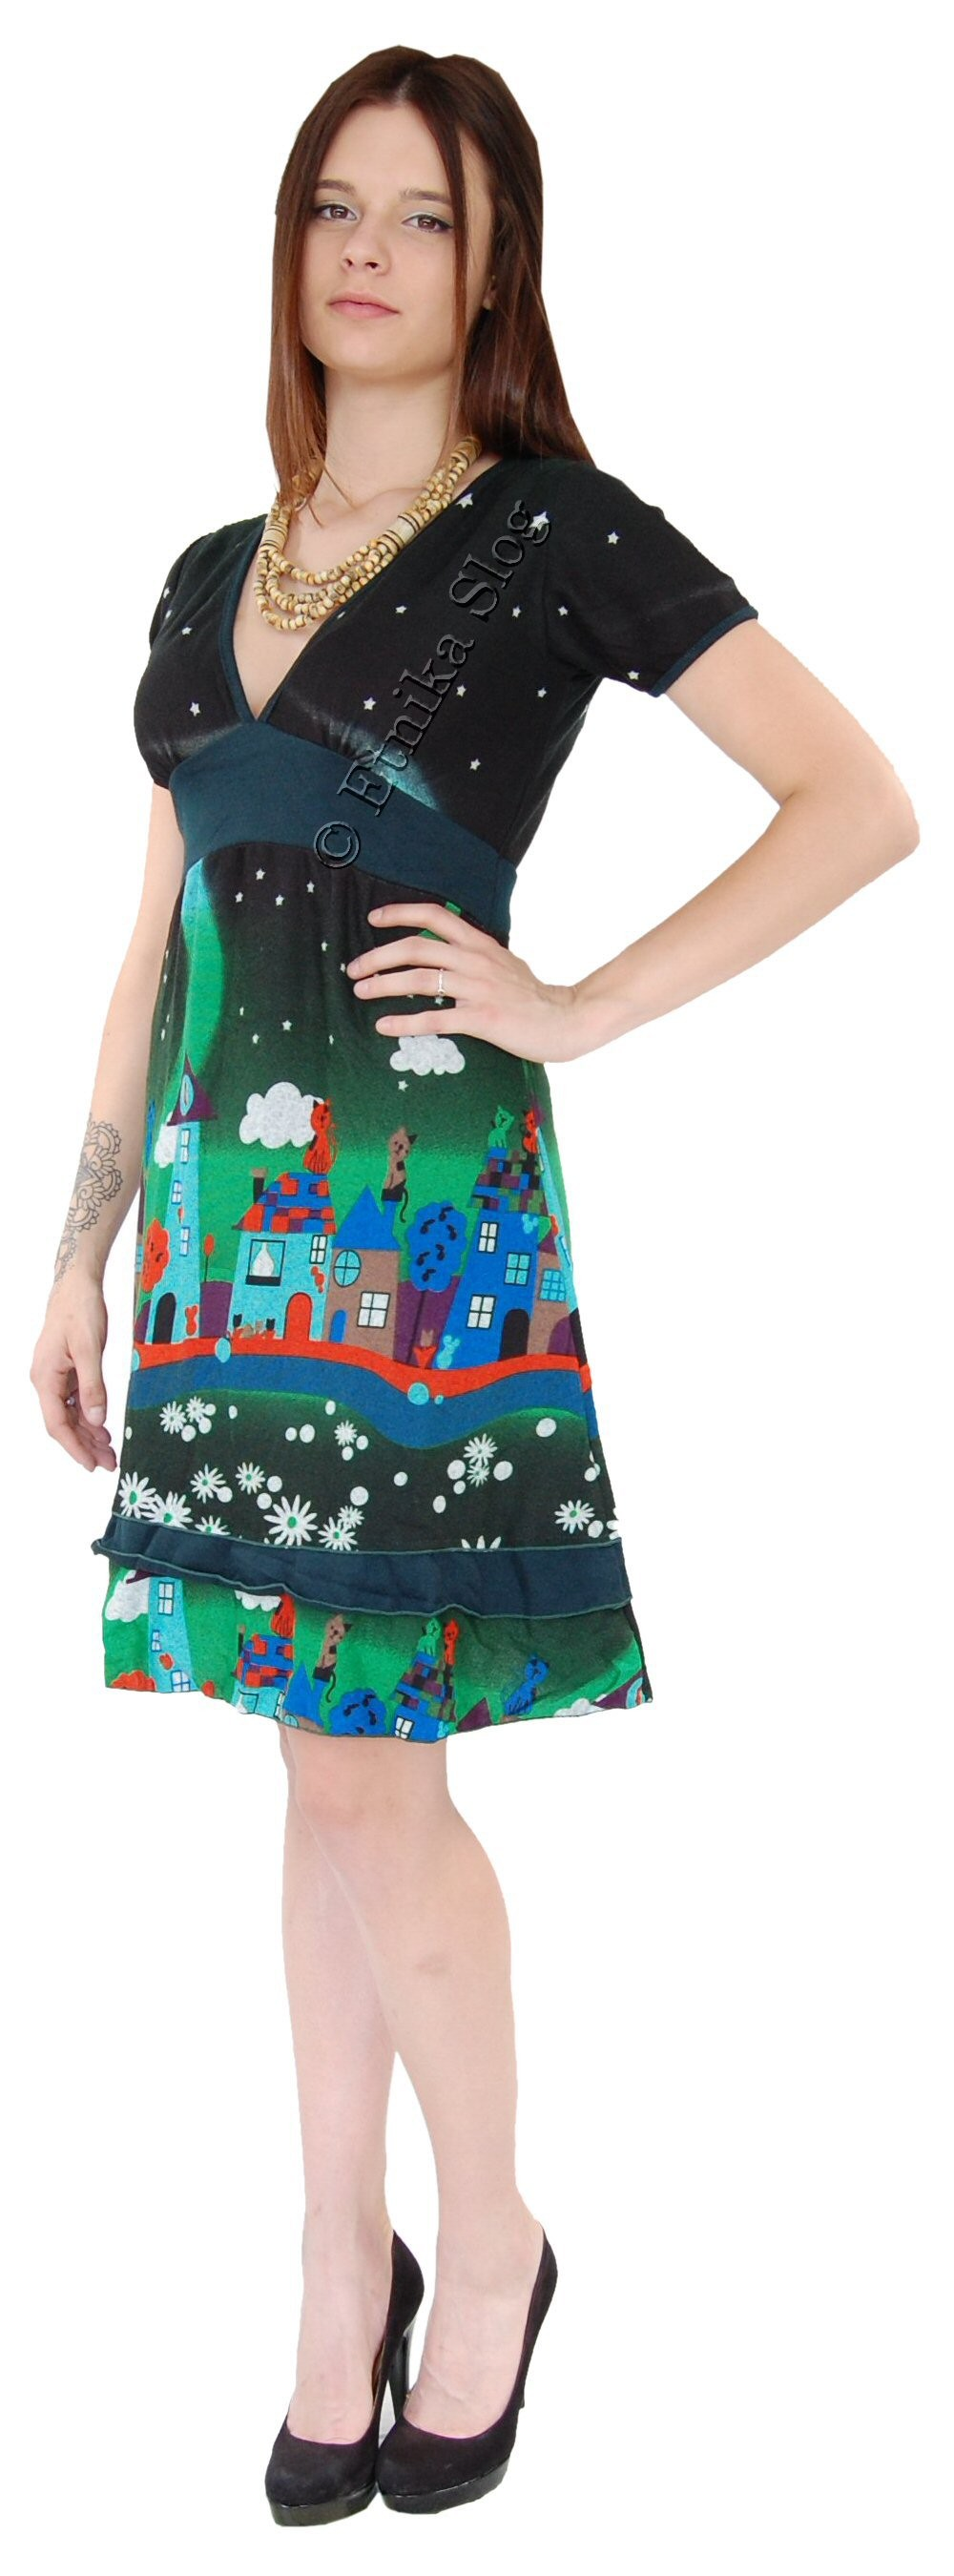 SLEEVELESS DRESSES - AUTUMN/WINTER AB-MRS117AJ - com Etnika Slog d.o.o.